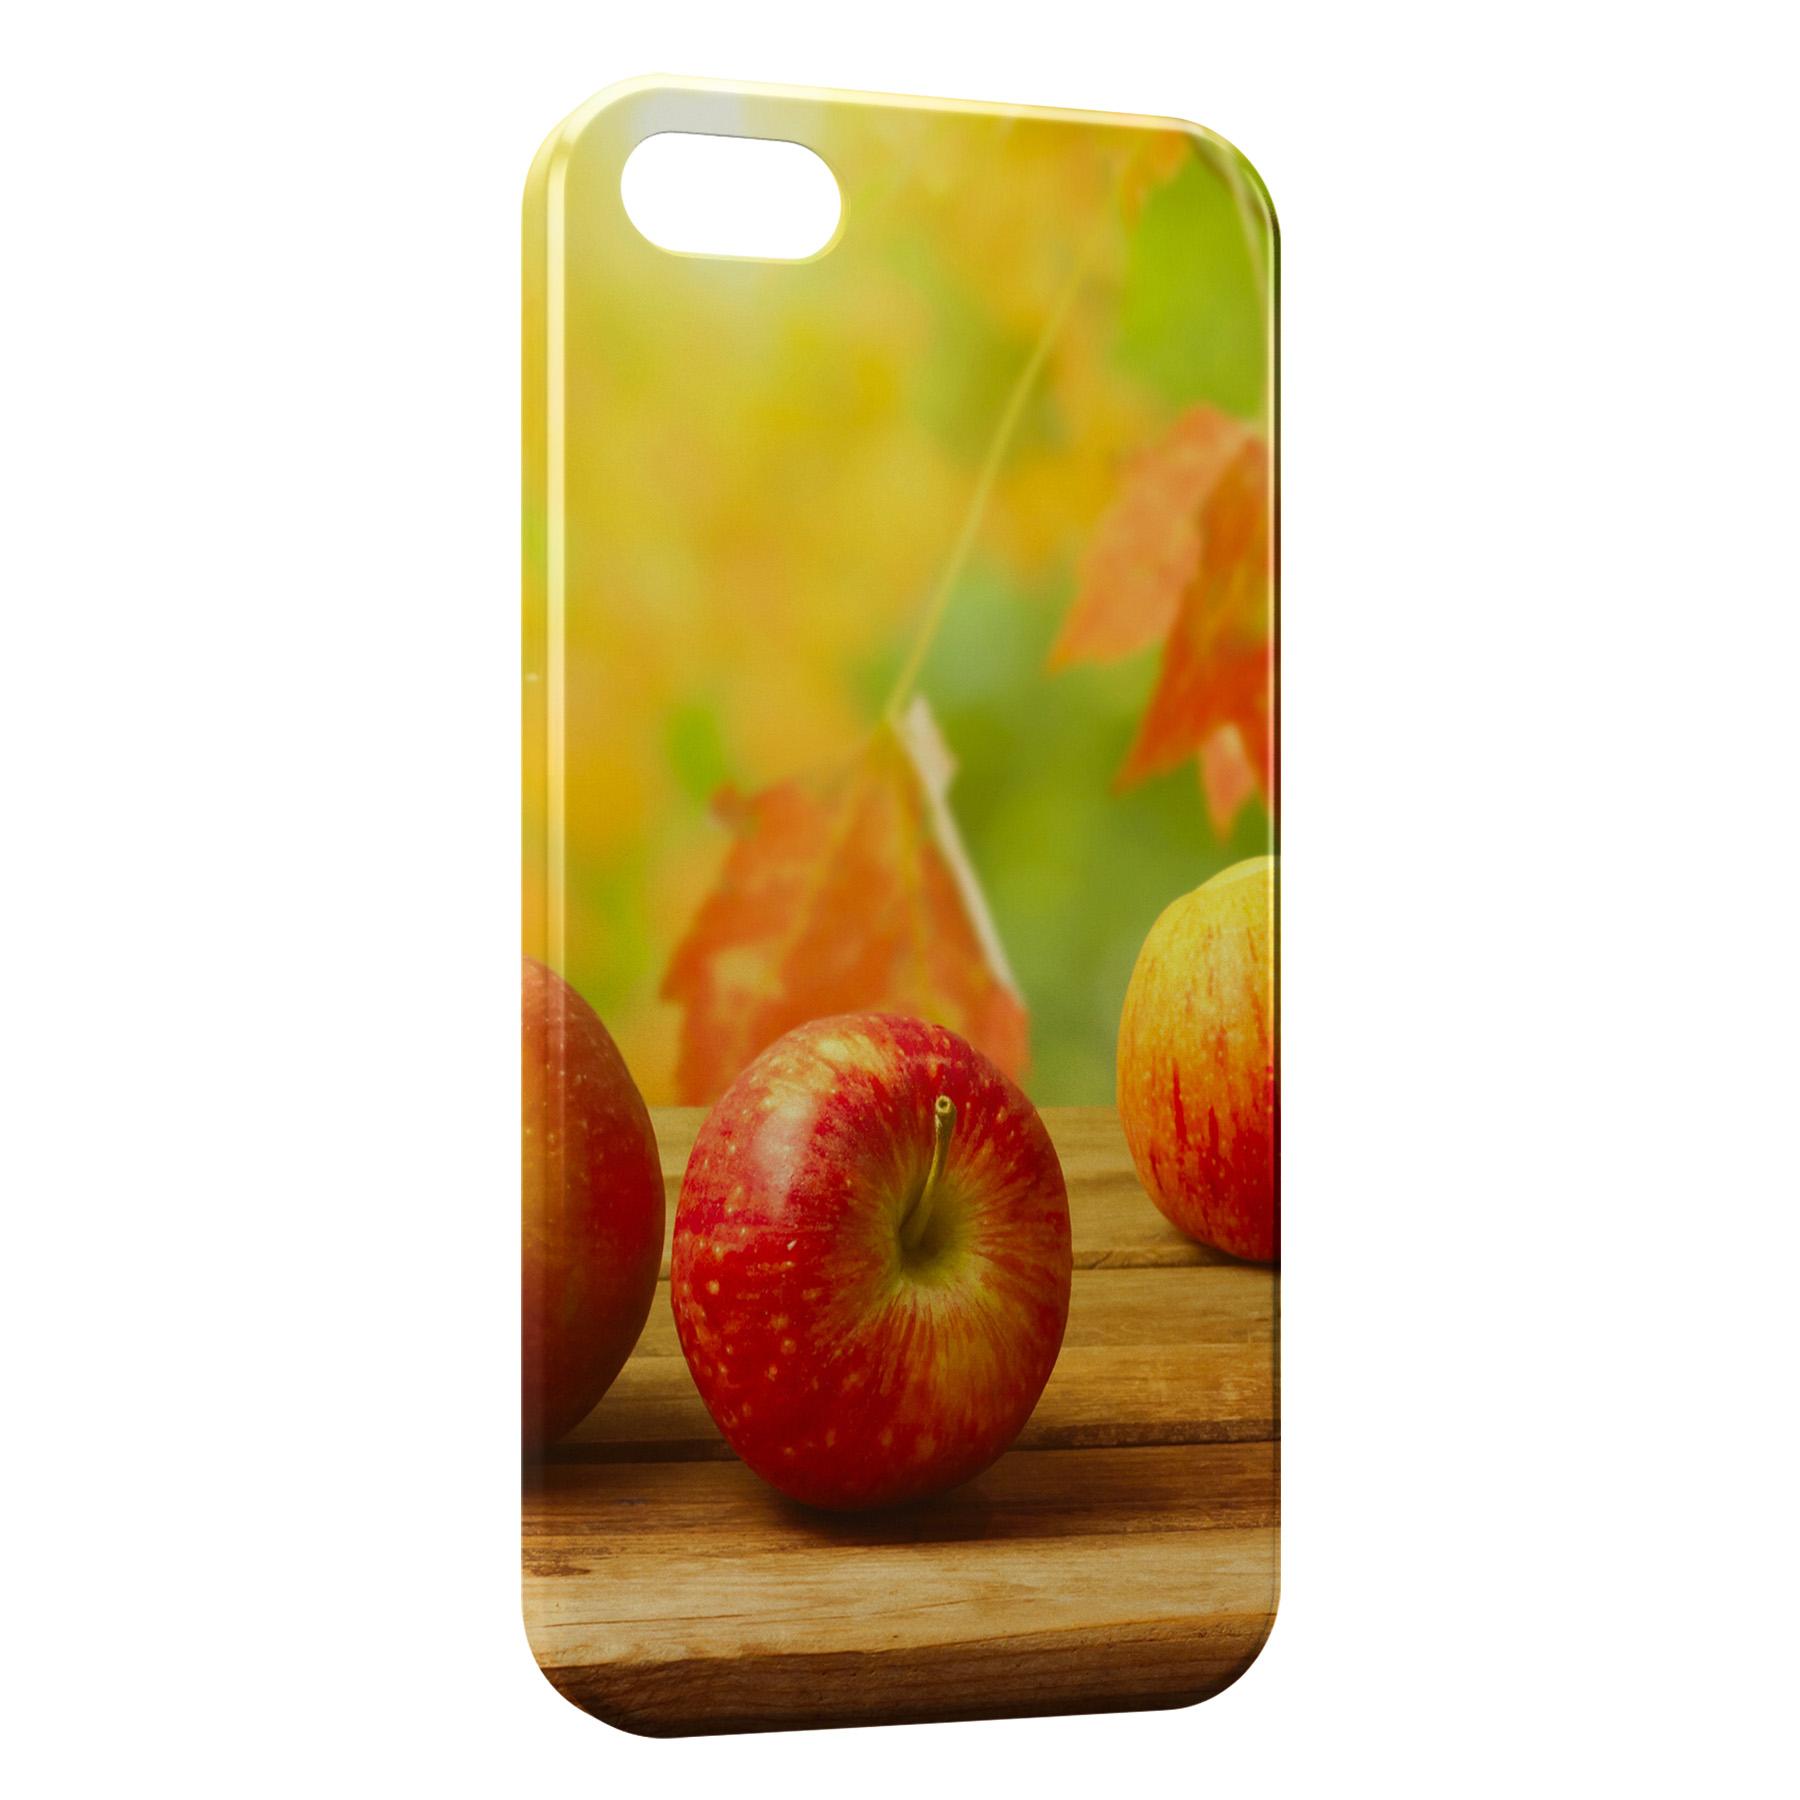 coque iphone 4 pomme